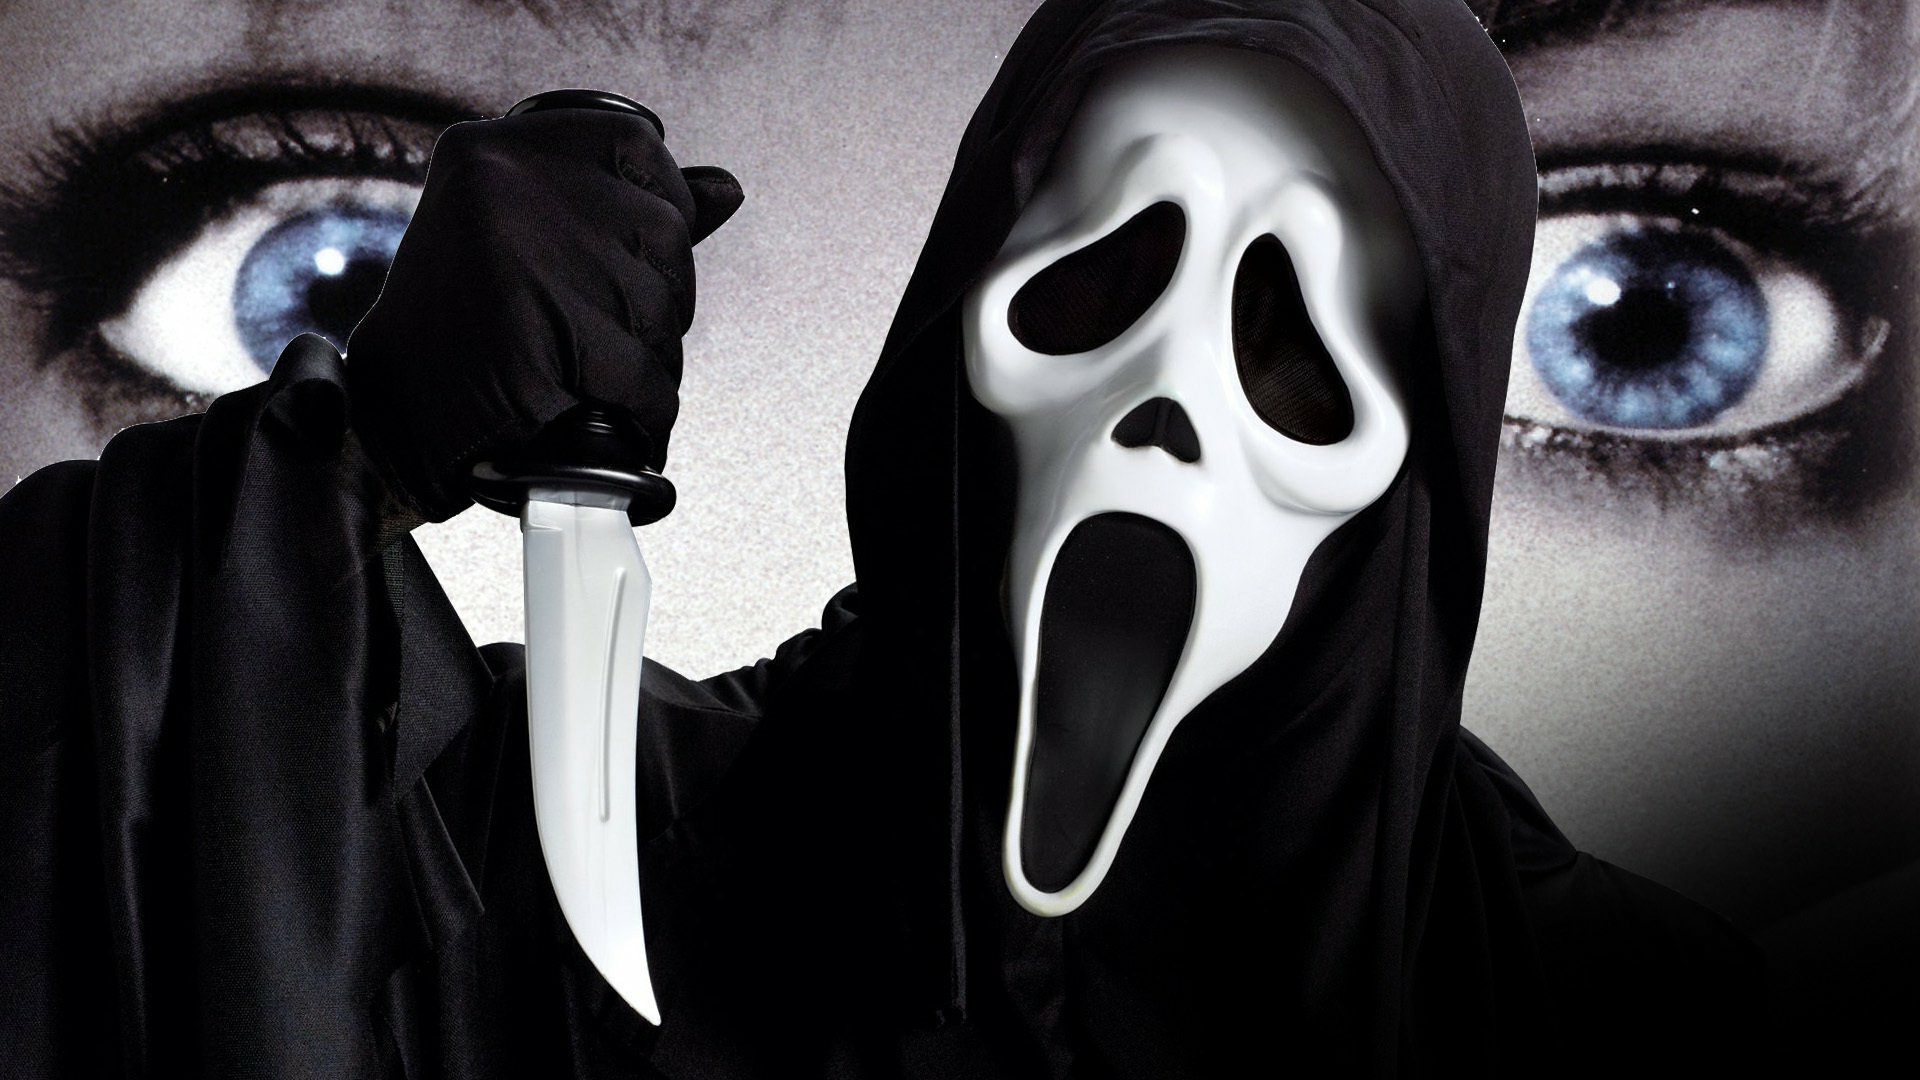 Scream HD Wallpaper | Background Image | 1920x1080 | ID ...